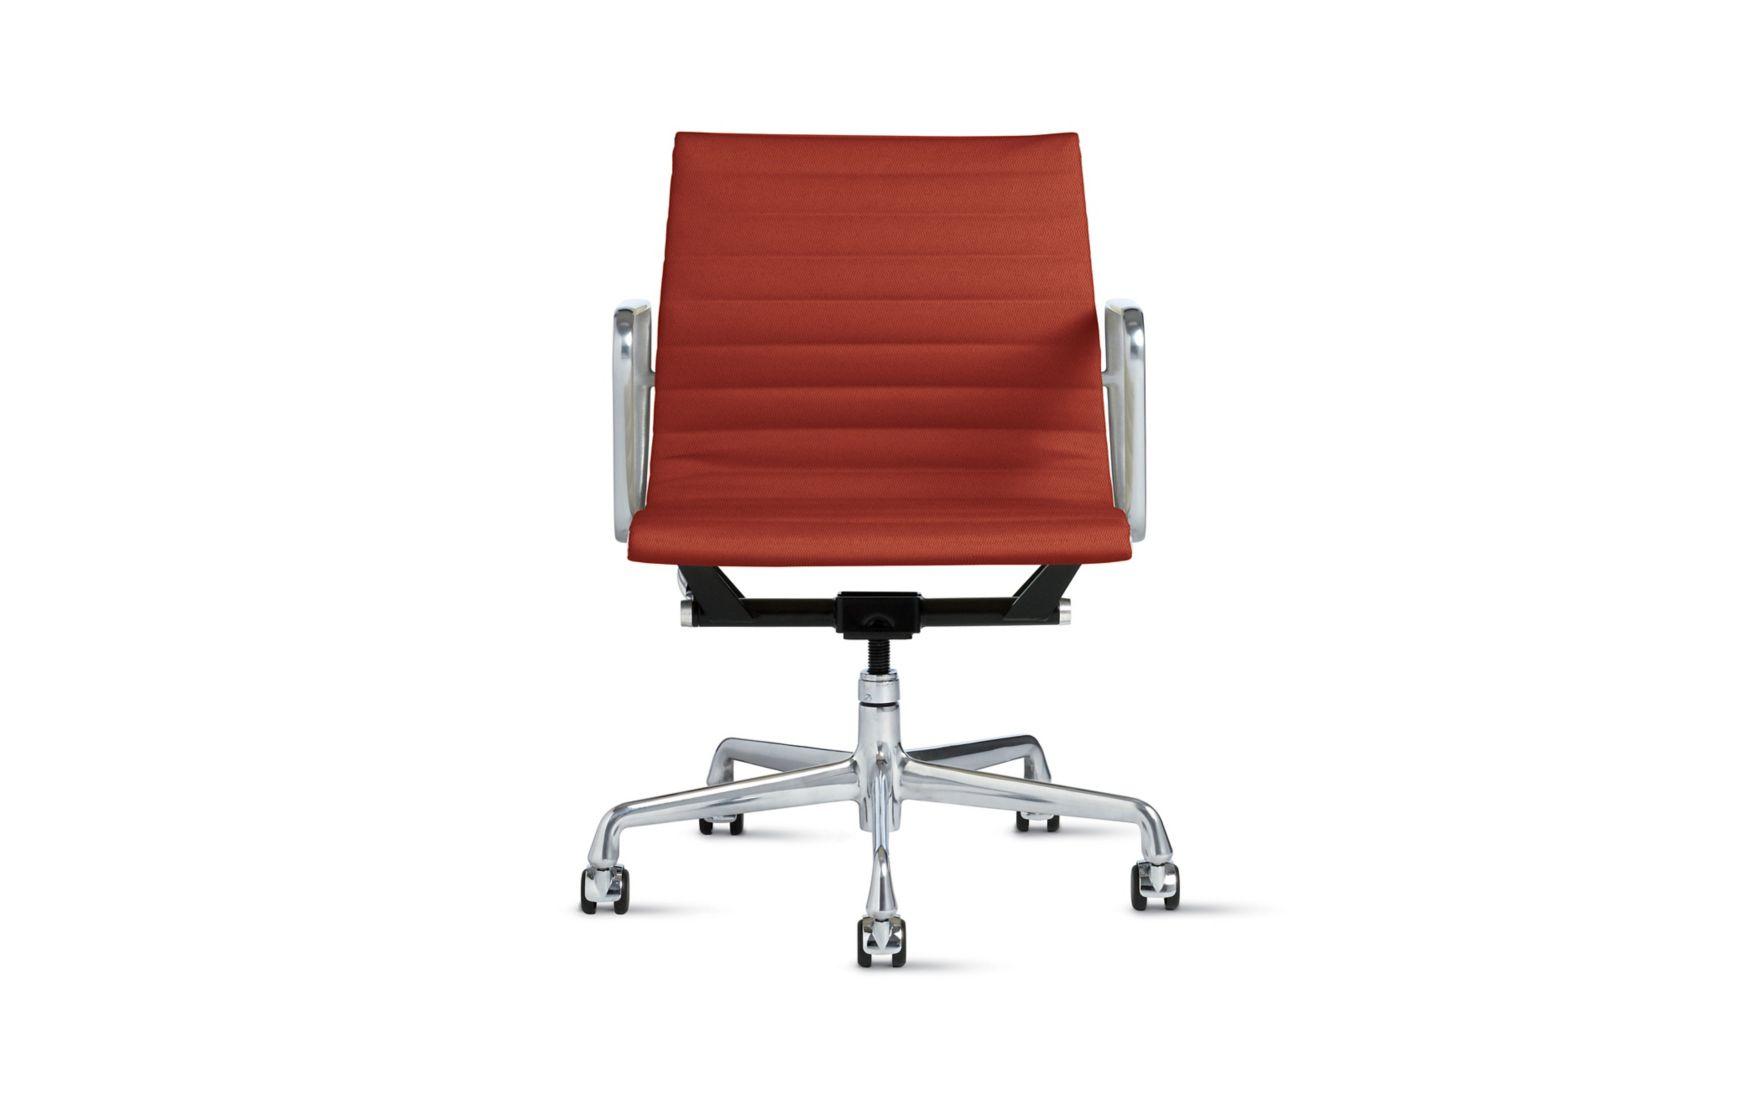 Eames Aluminum Management Chair Design Within Reach